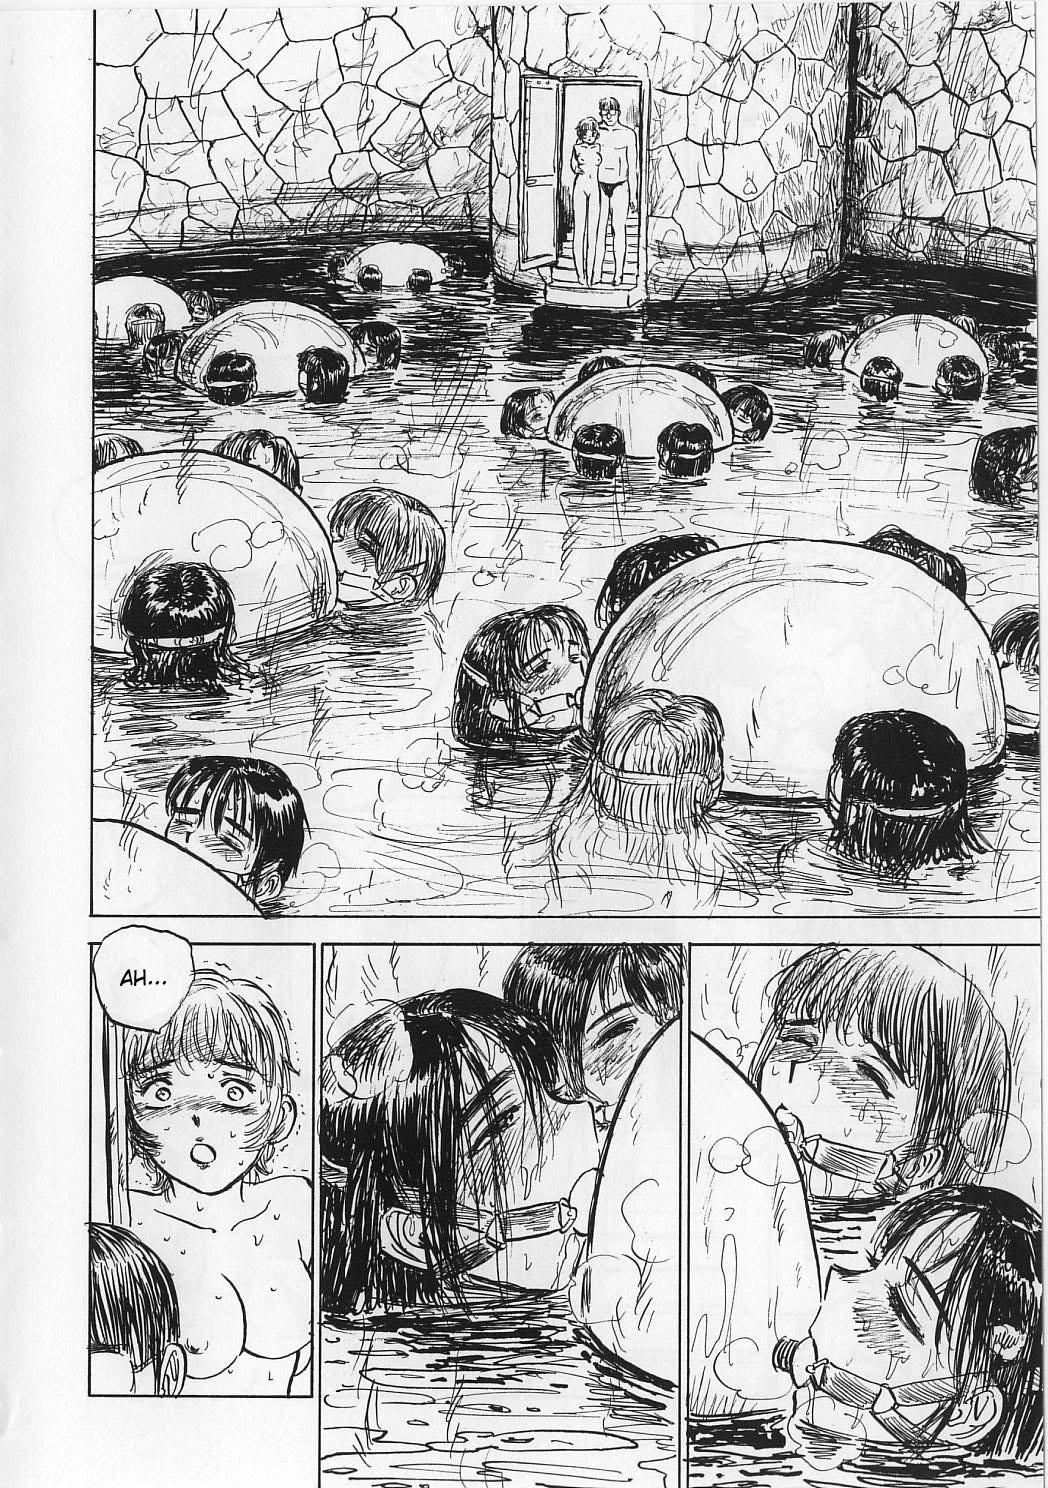 [Momoyama Jirou] Ningyou no Yakata - The Doll House Ch. 1-4 [English] 41